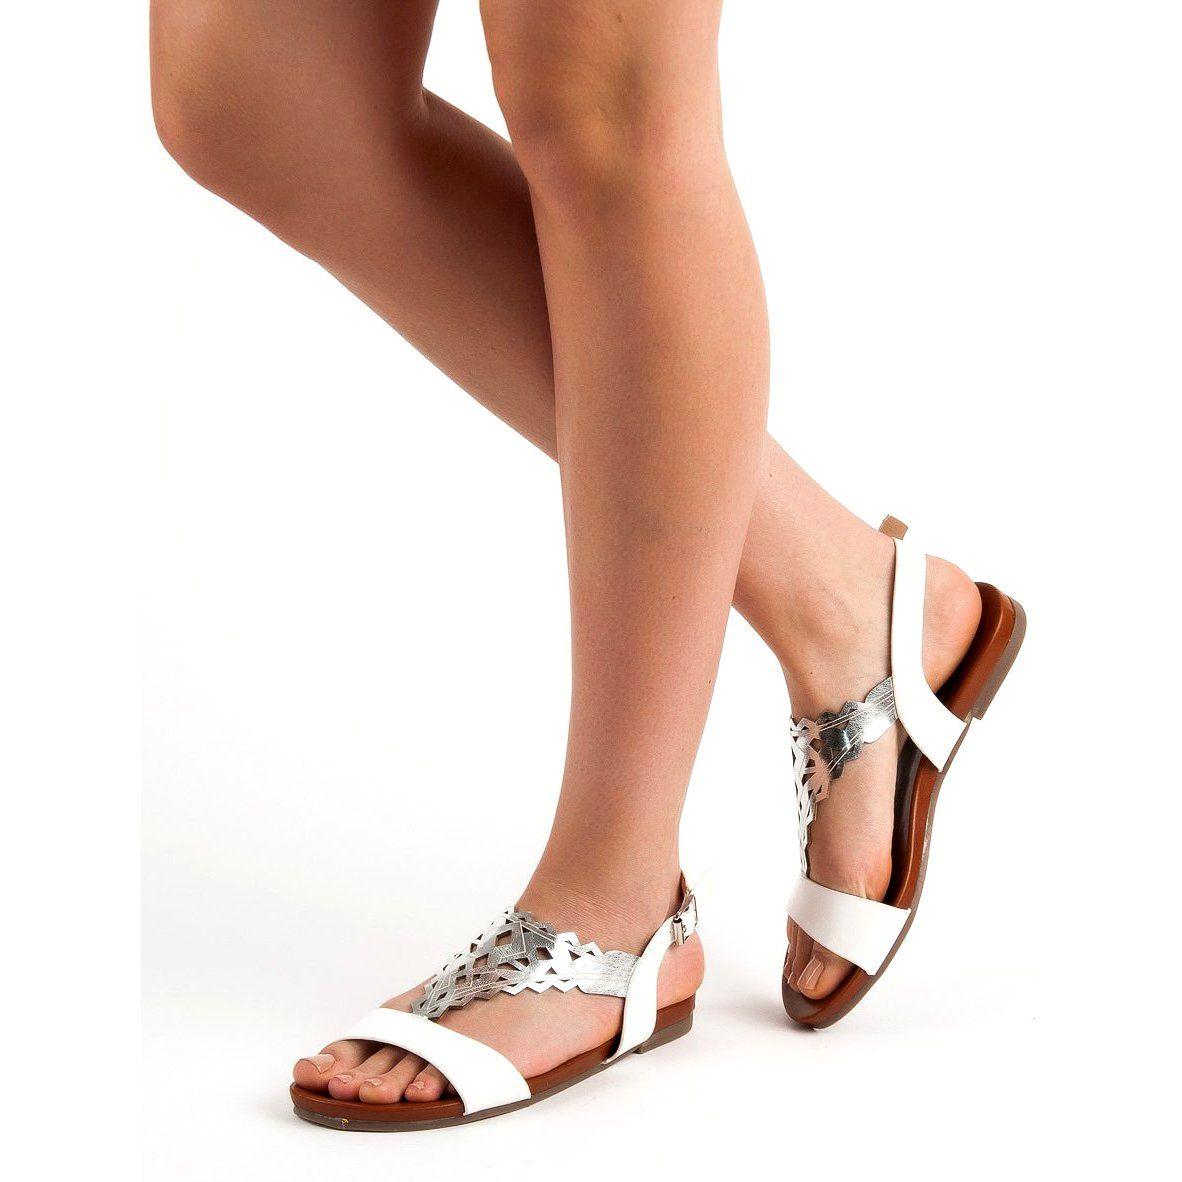 Sandaly Damskie Kylie Kylie Biale Stylowe Plaskie Sandalki Womens Sandals Sandals Stylish Flats